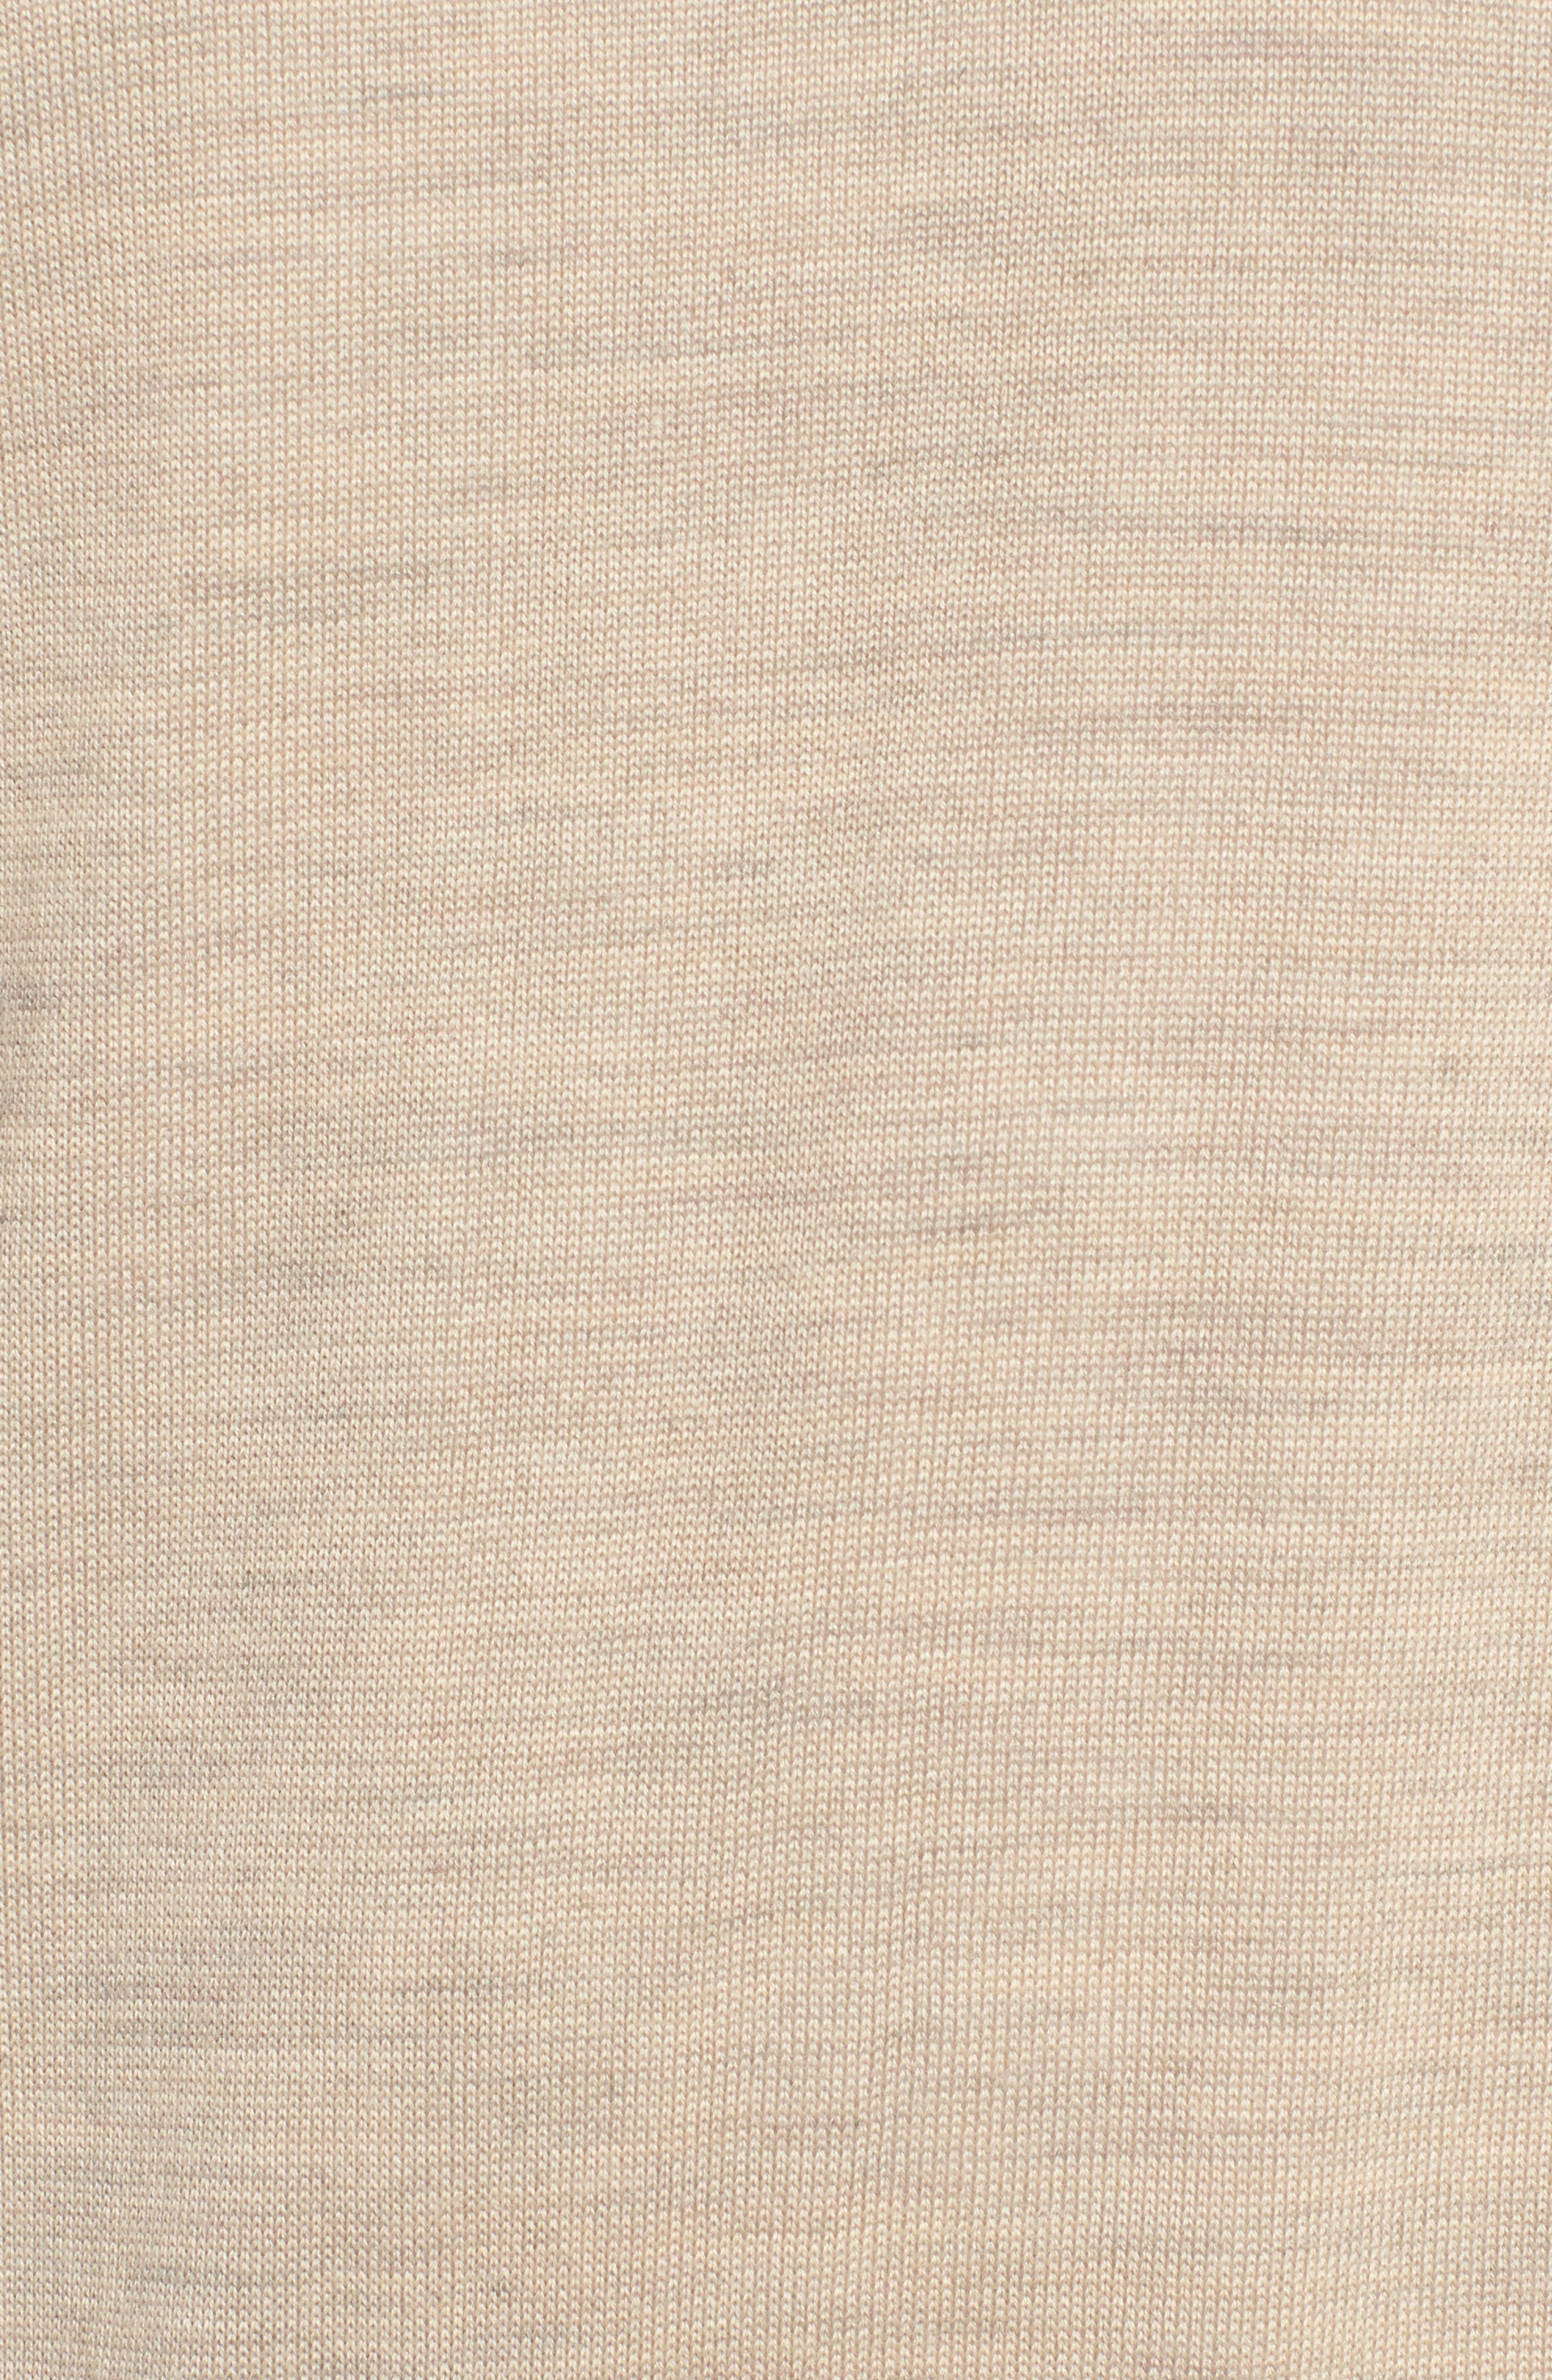 CUTTER & BUCK, 'Douglas' Merino Wool Blend V-Neck Sweater, Alternate thumbnail 5, color, SAND HEATHER